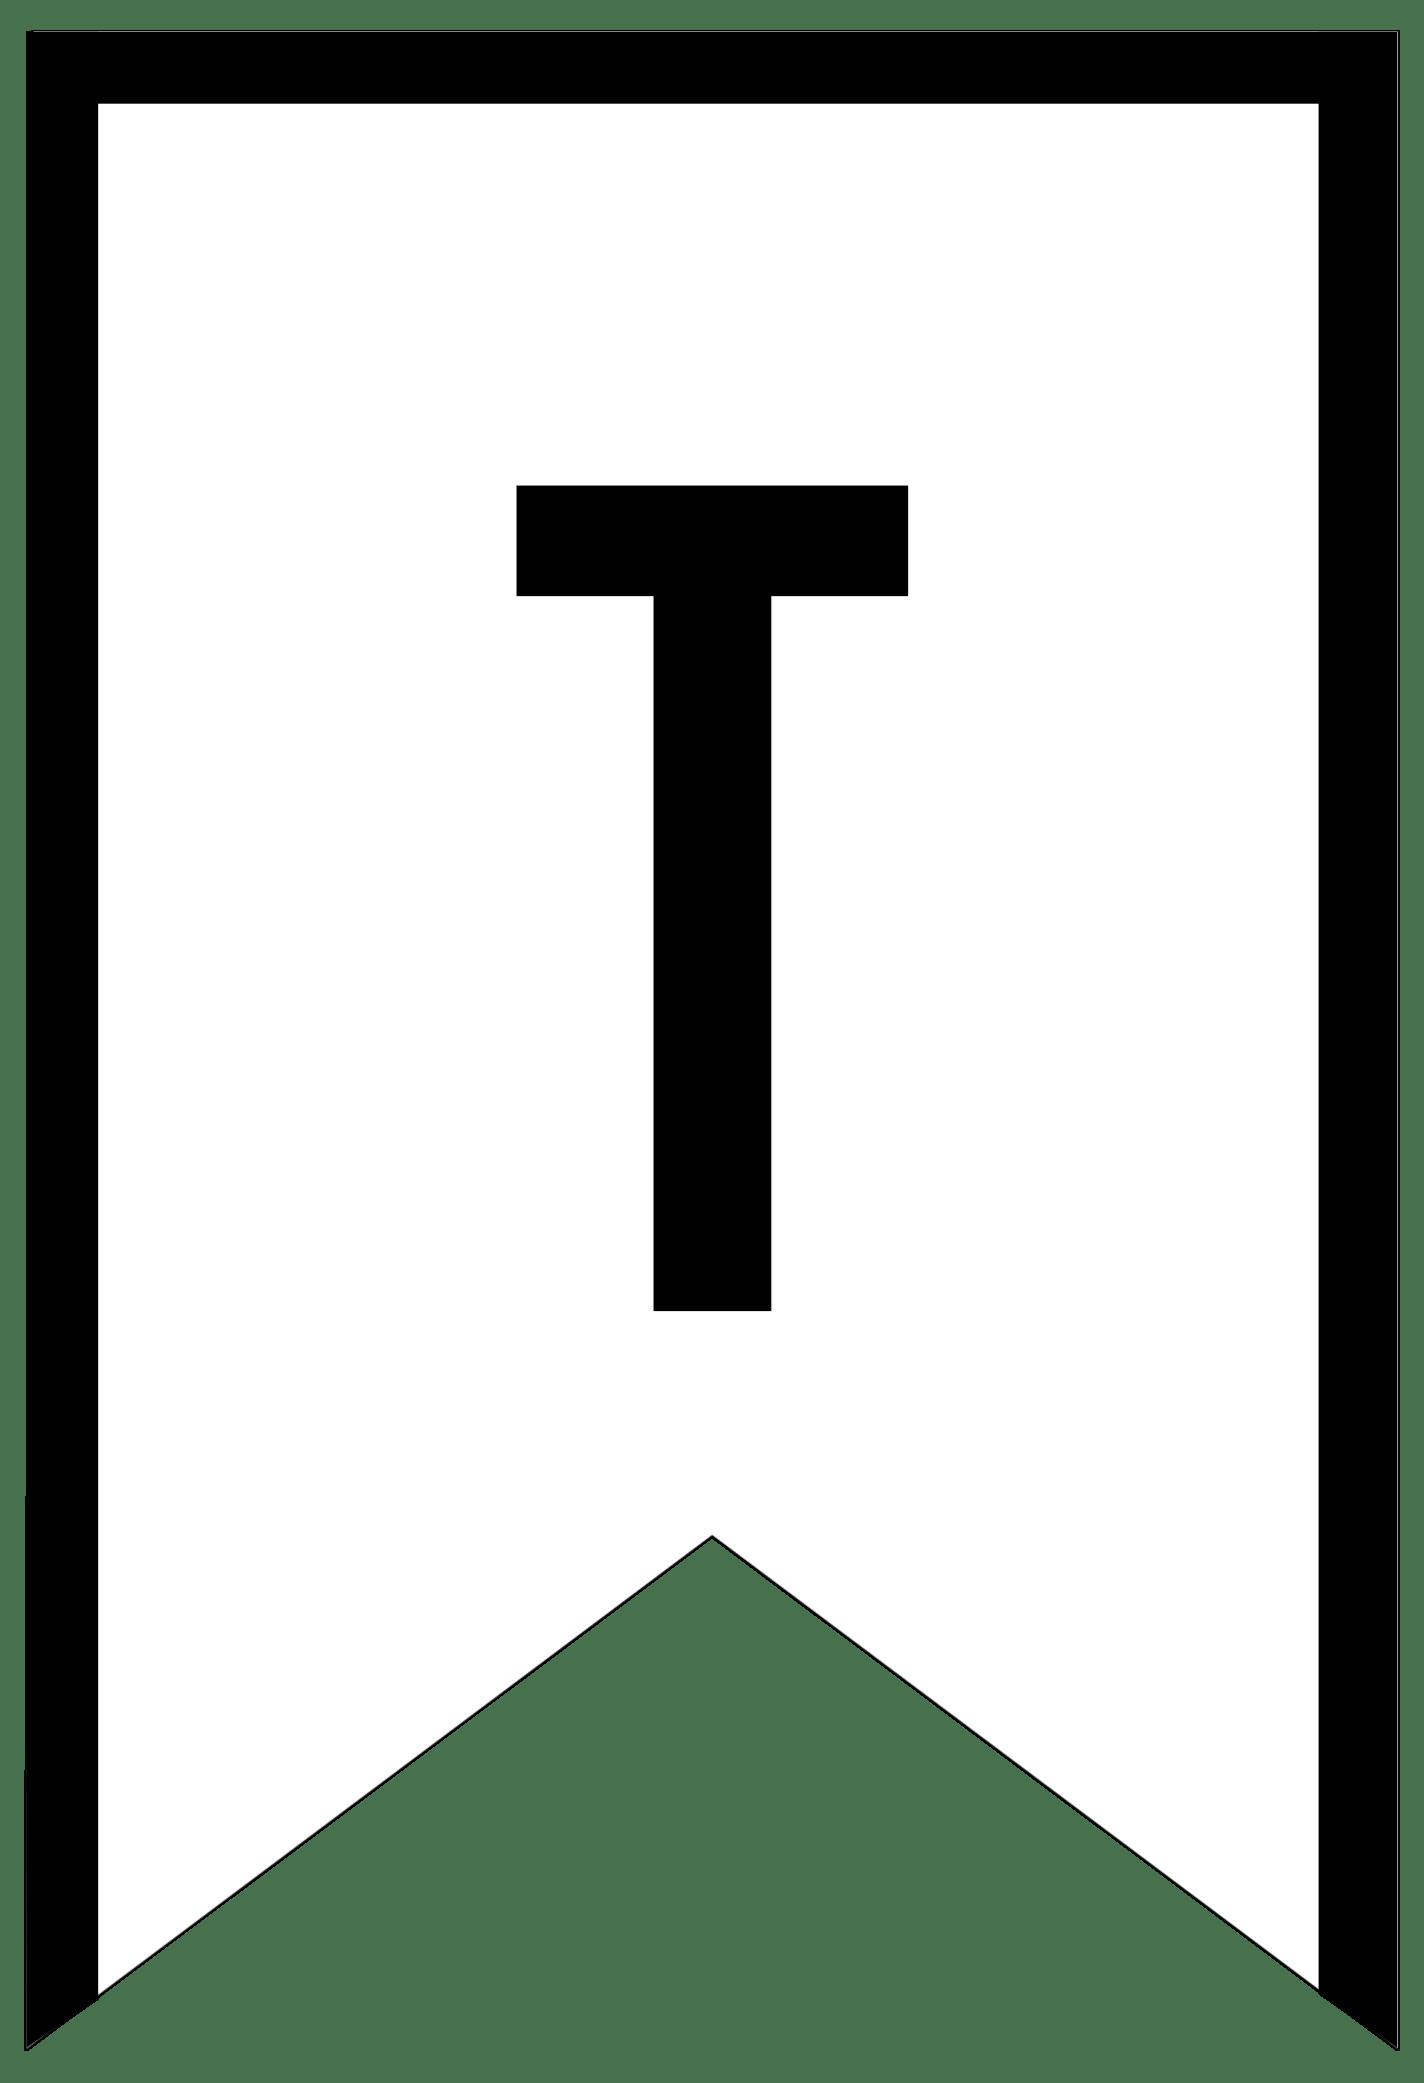 letter banner template